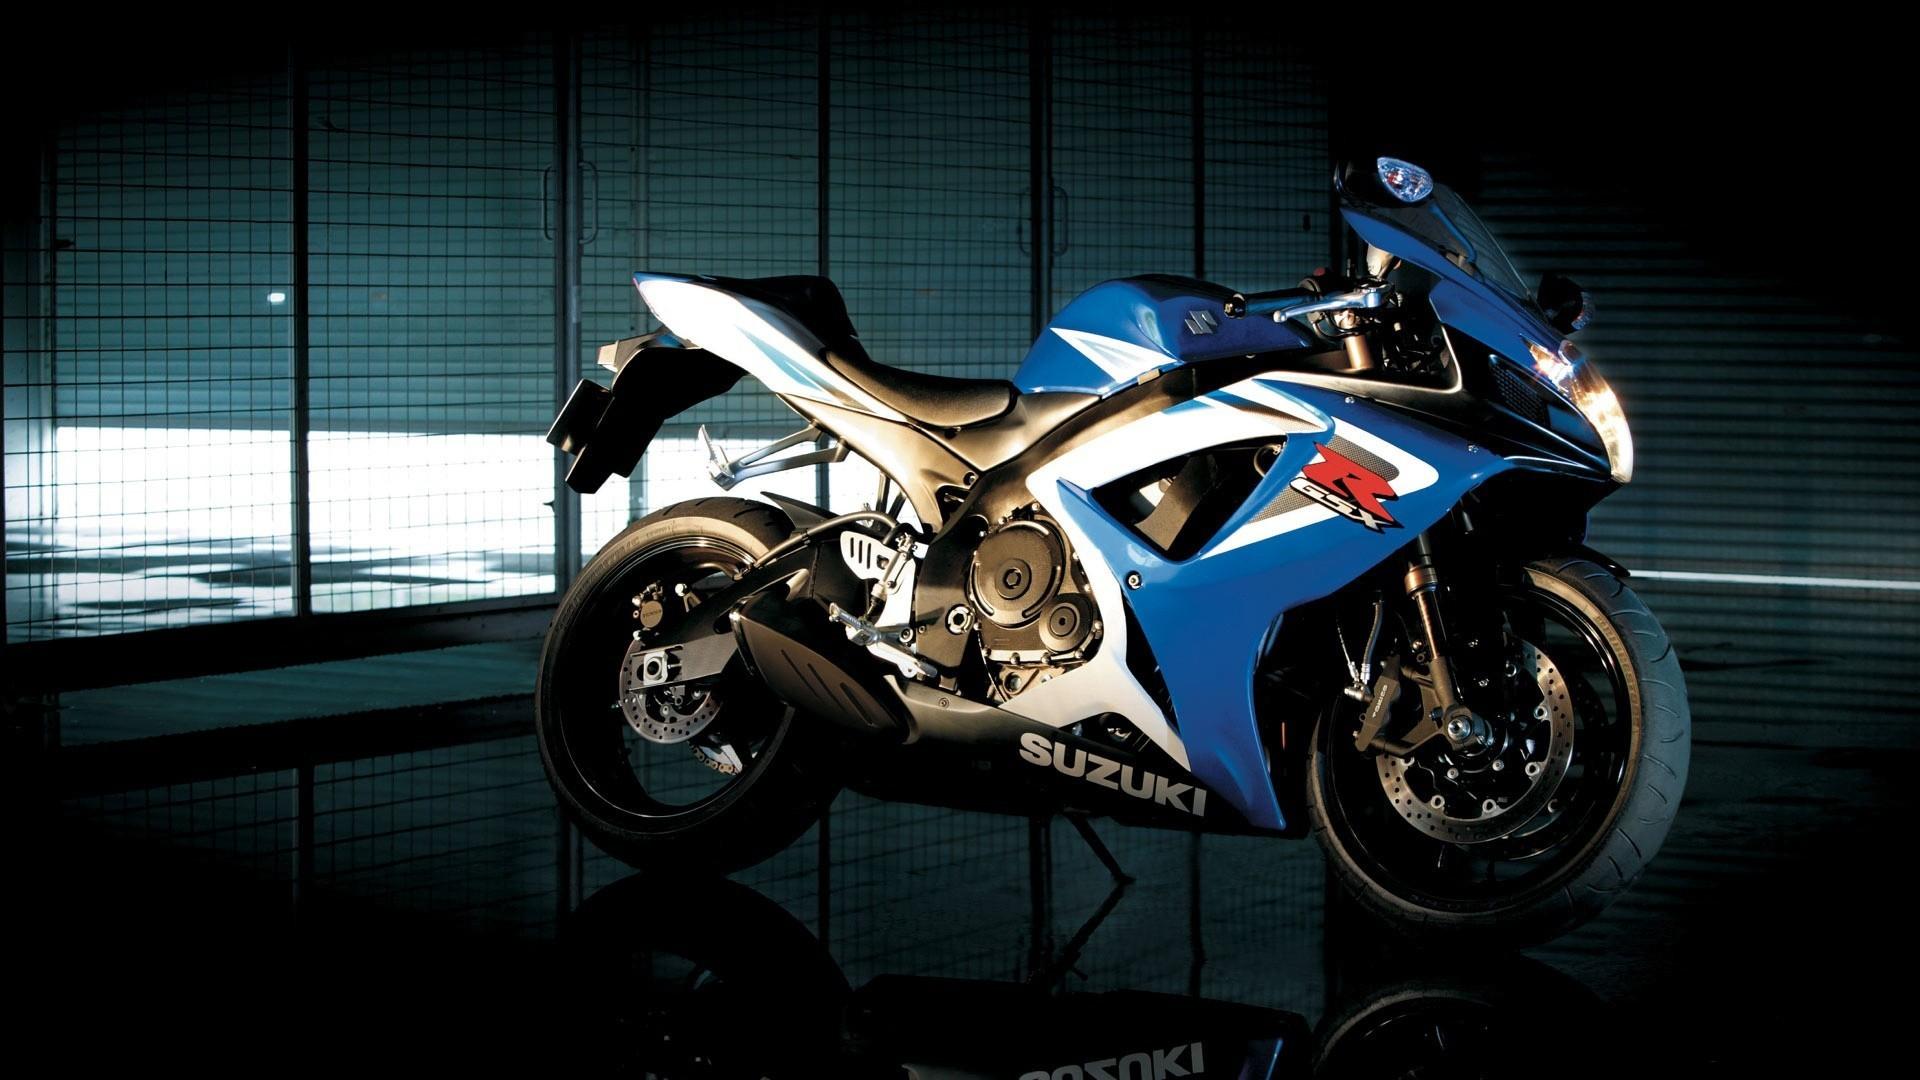 Sportbike Wallpaper Hd 65 Images